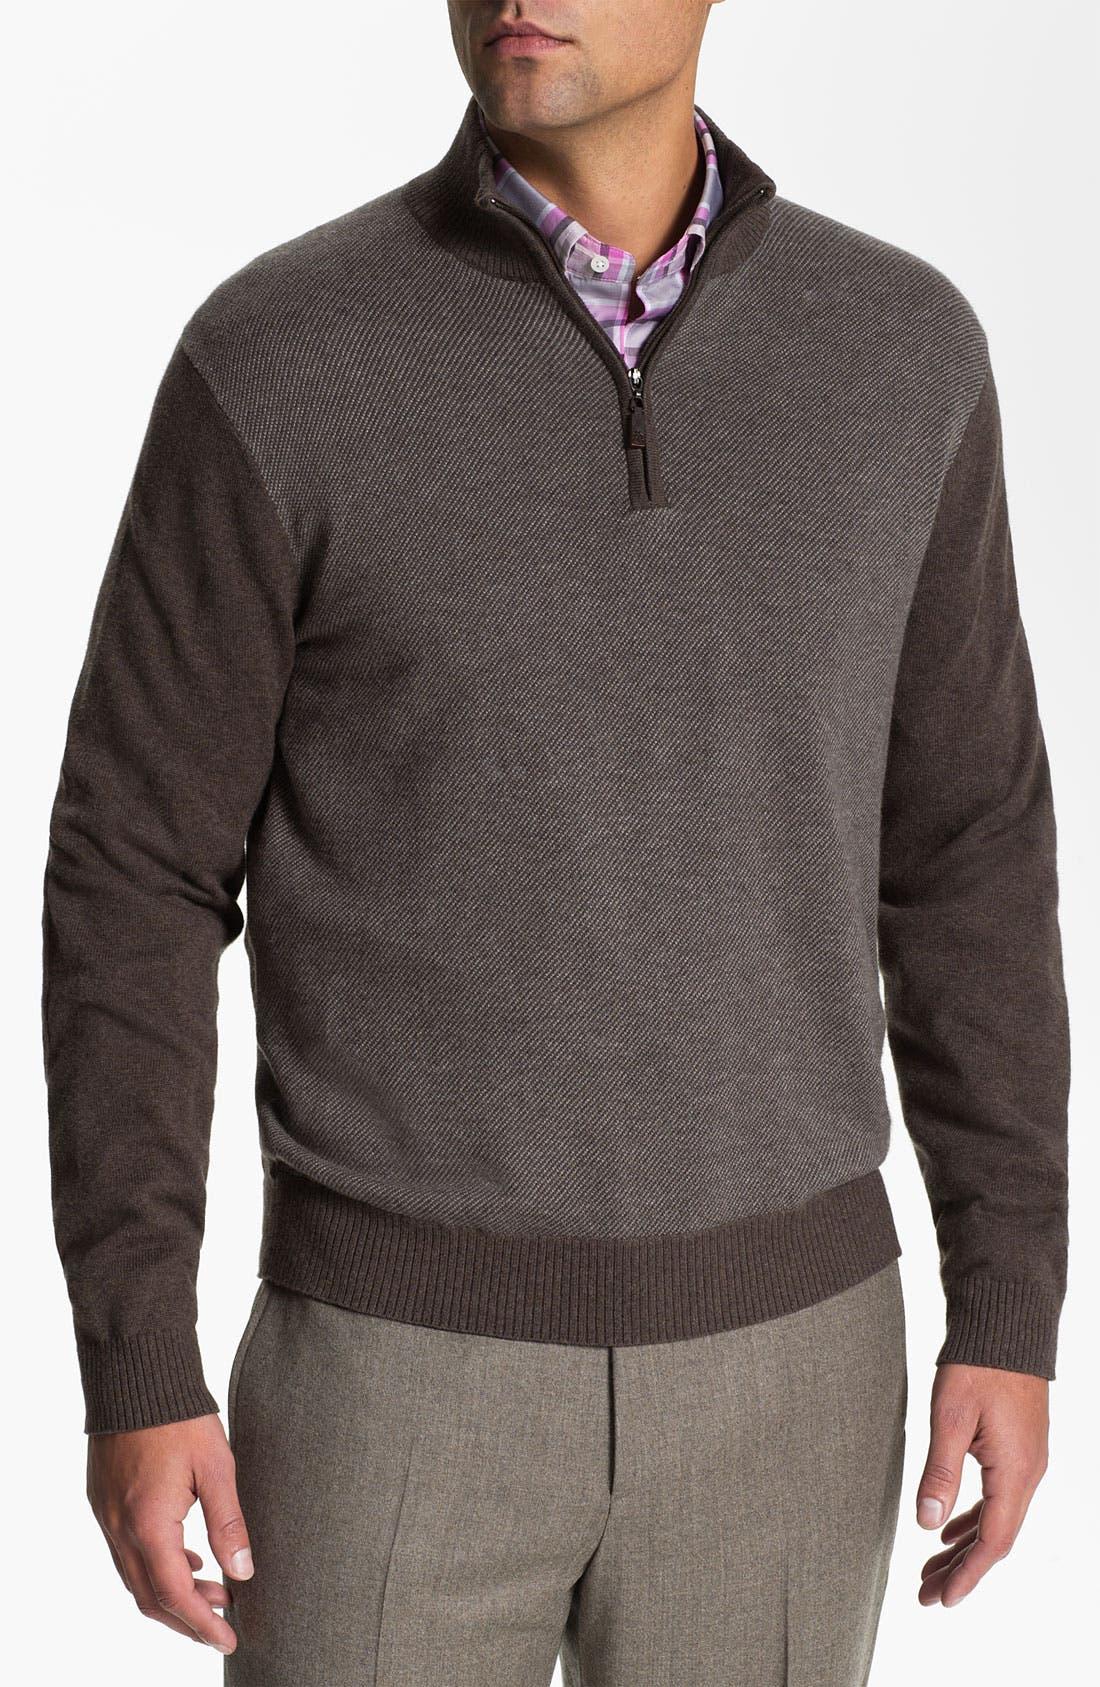 Main Image - Robert Talbott Quarter Zip Cotton & Cashmere Sweater